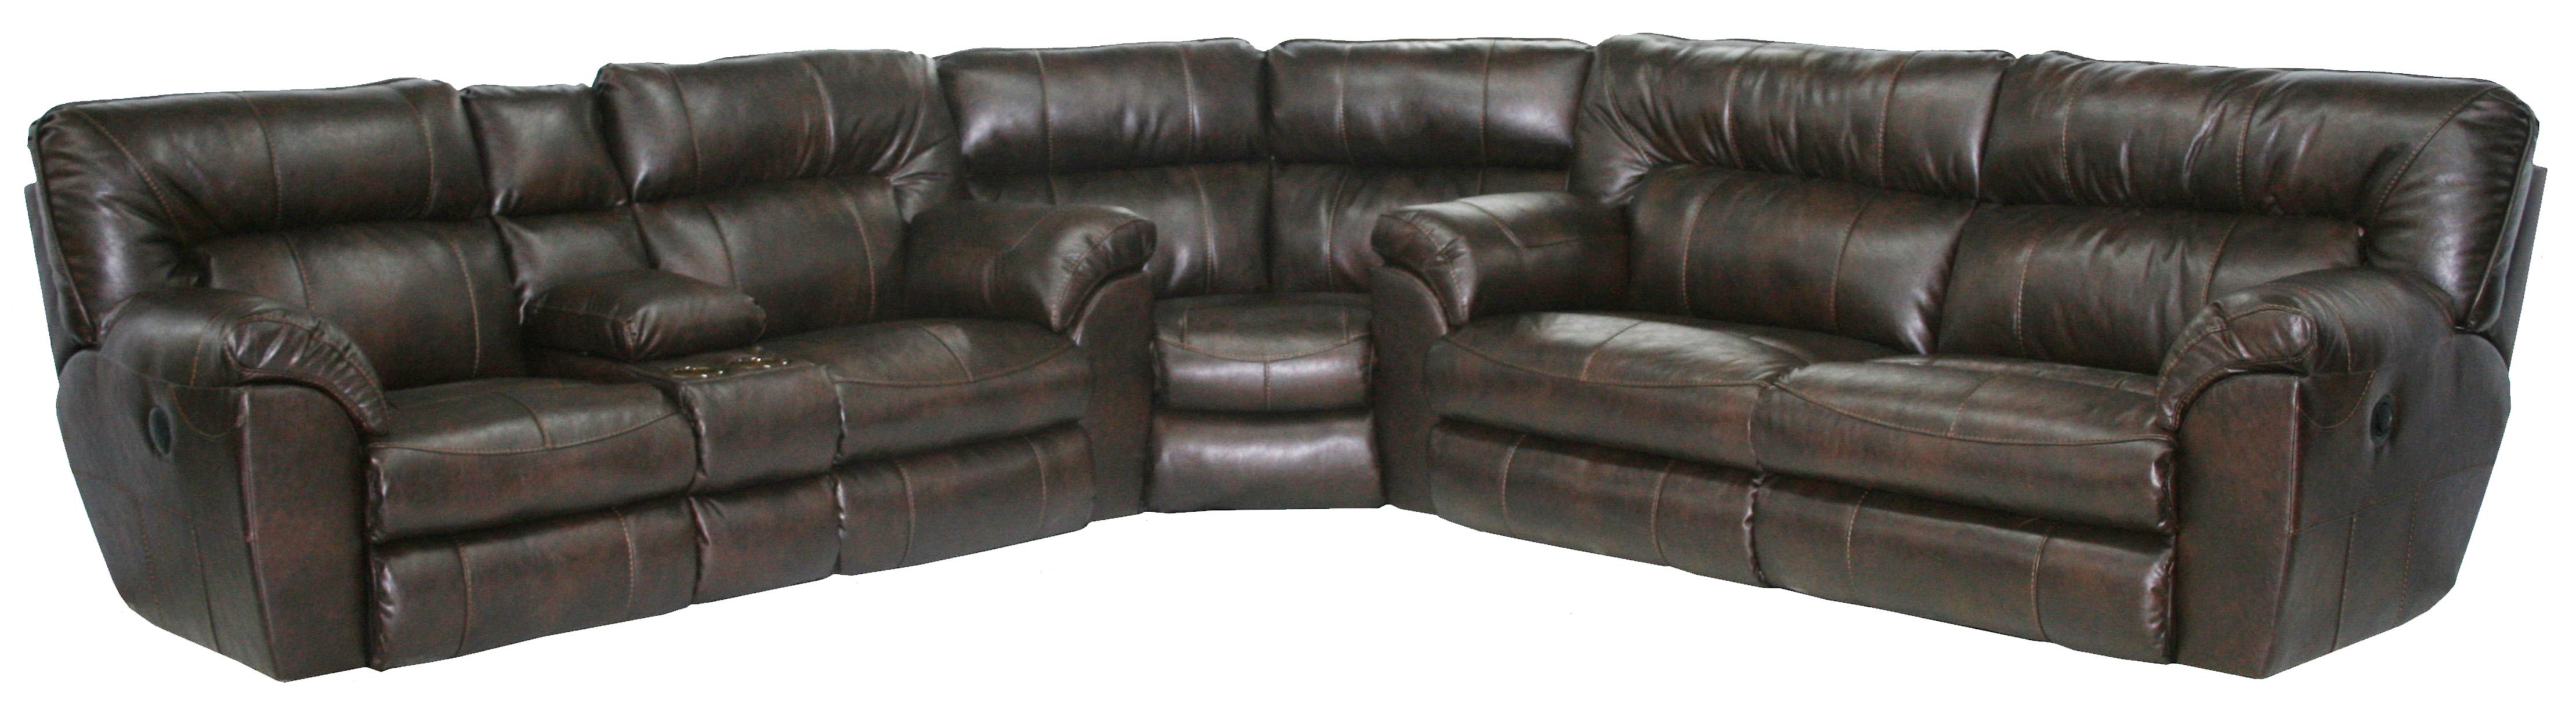 Groovy Nolan Reclining Sectional Extra Wide Seats Sofas And Inzonedesignstudio Interior Chair Design Inzonedesignstudiocom